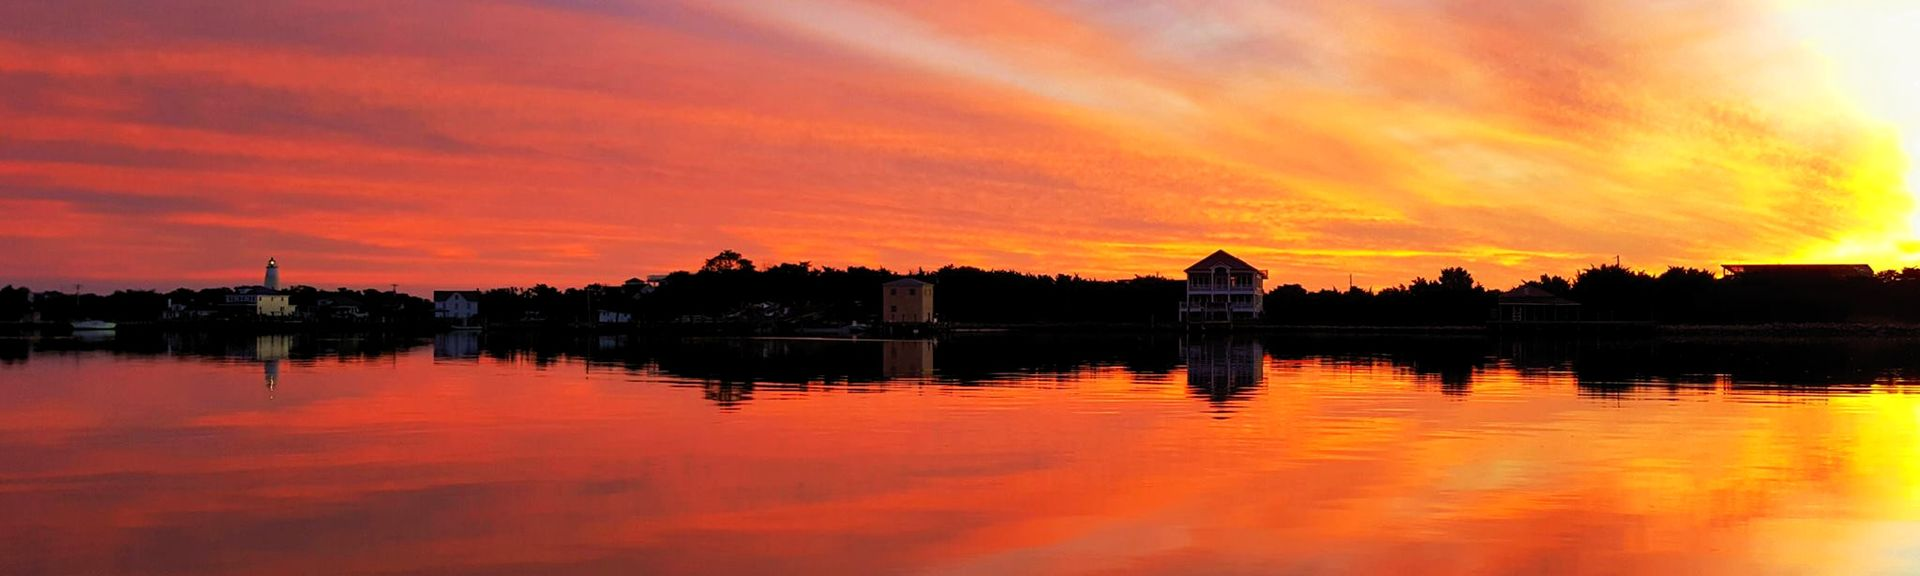 Ocracoke Island Visitor Center, Ocracoke, NC, USA